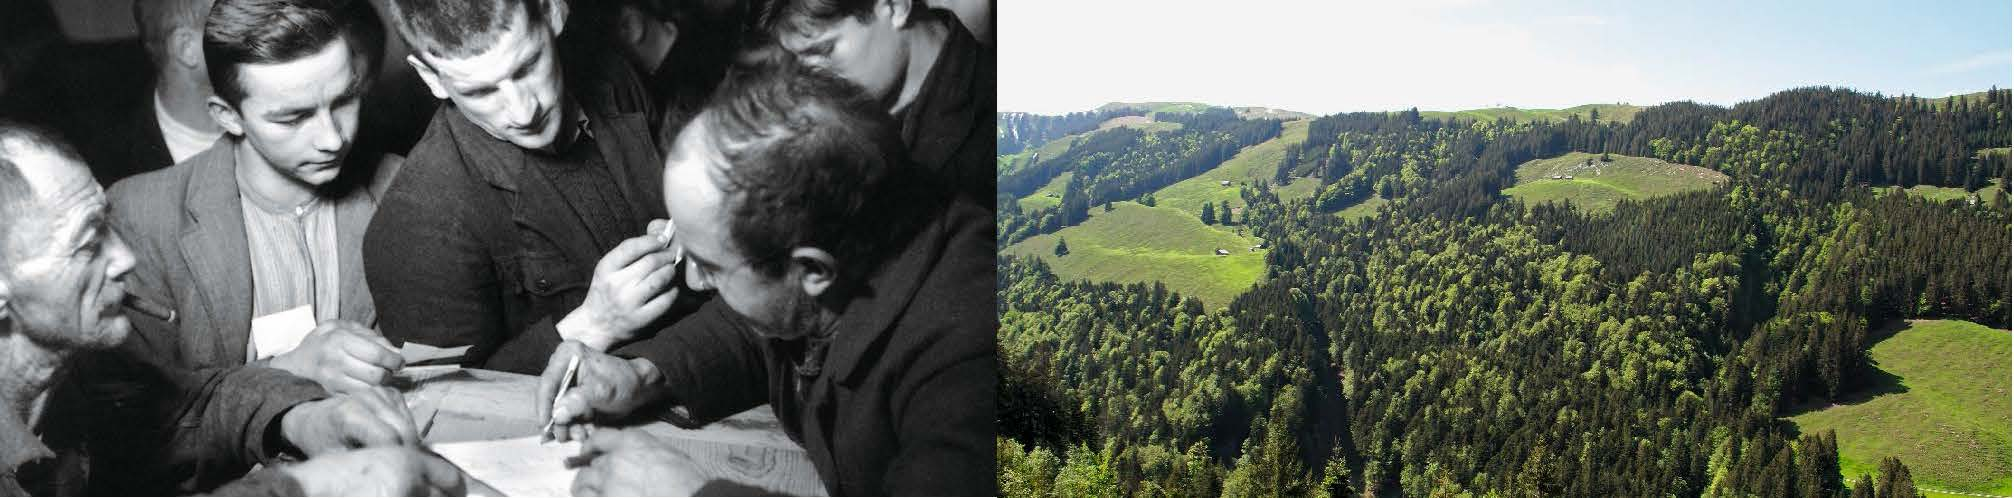 Verlosung des Holznutzens (Sigriswil 1946, Ernst Brunner, Archiv für Volkskunde, Basel)